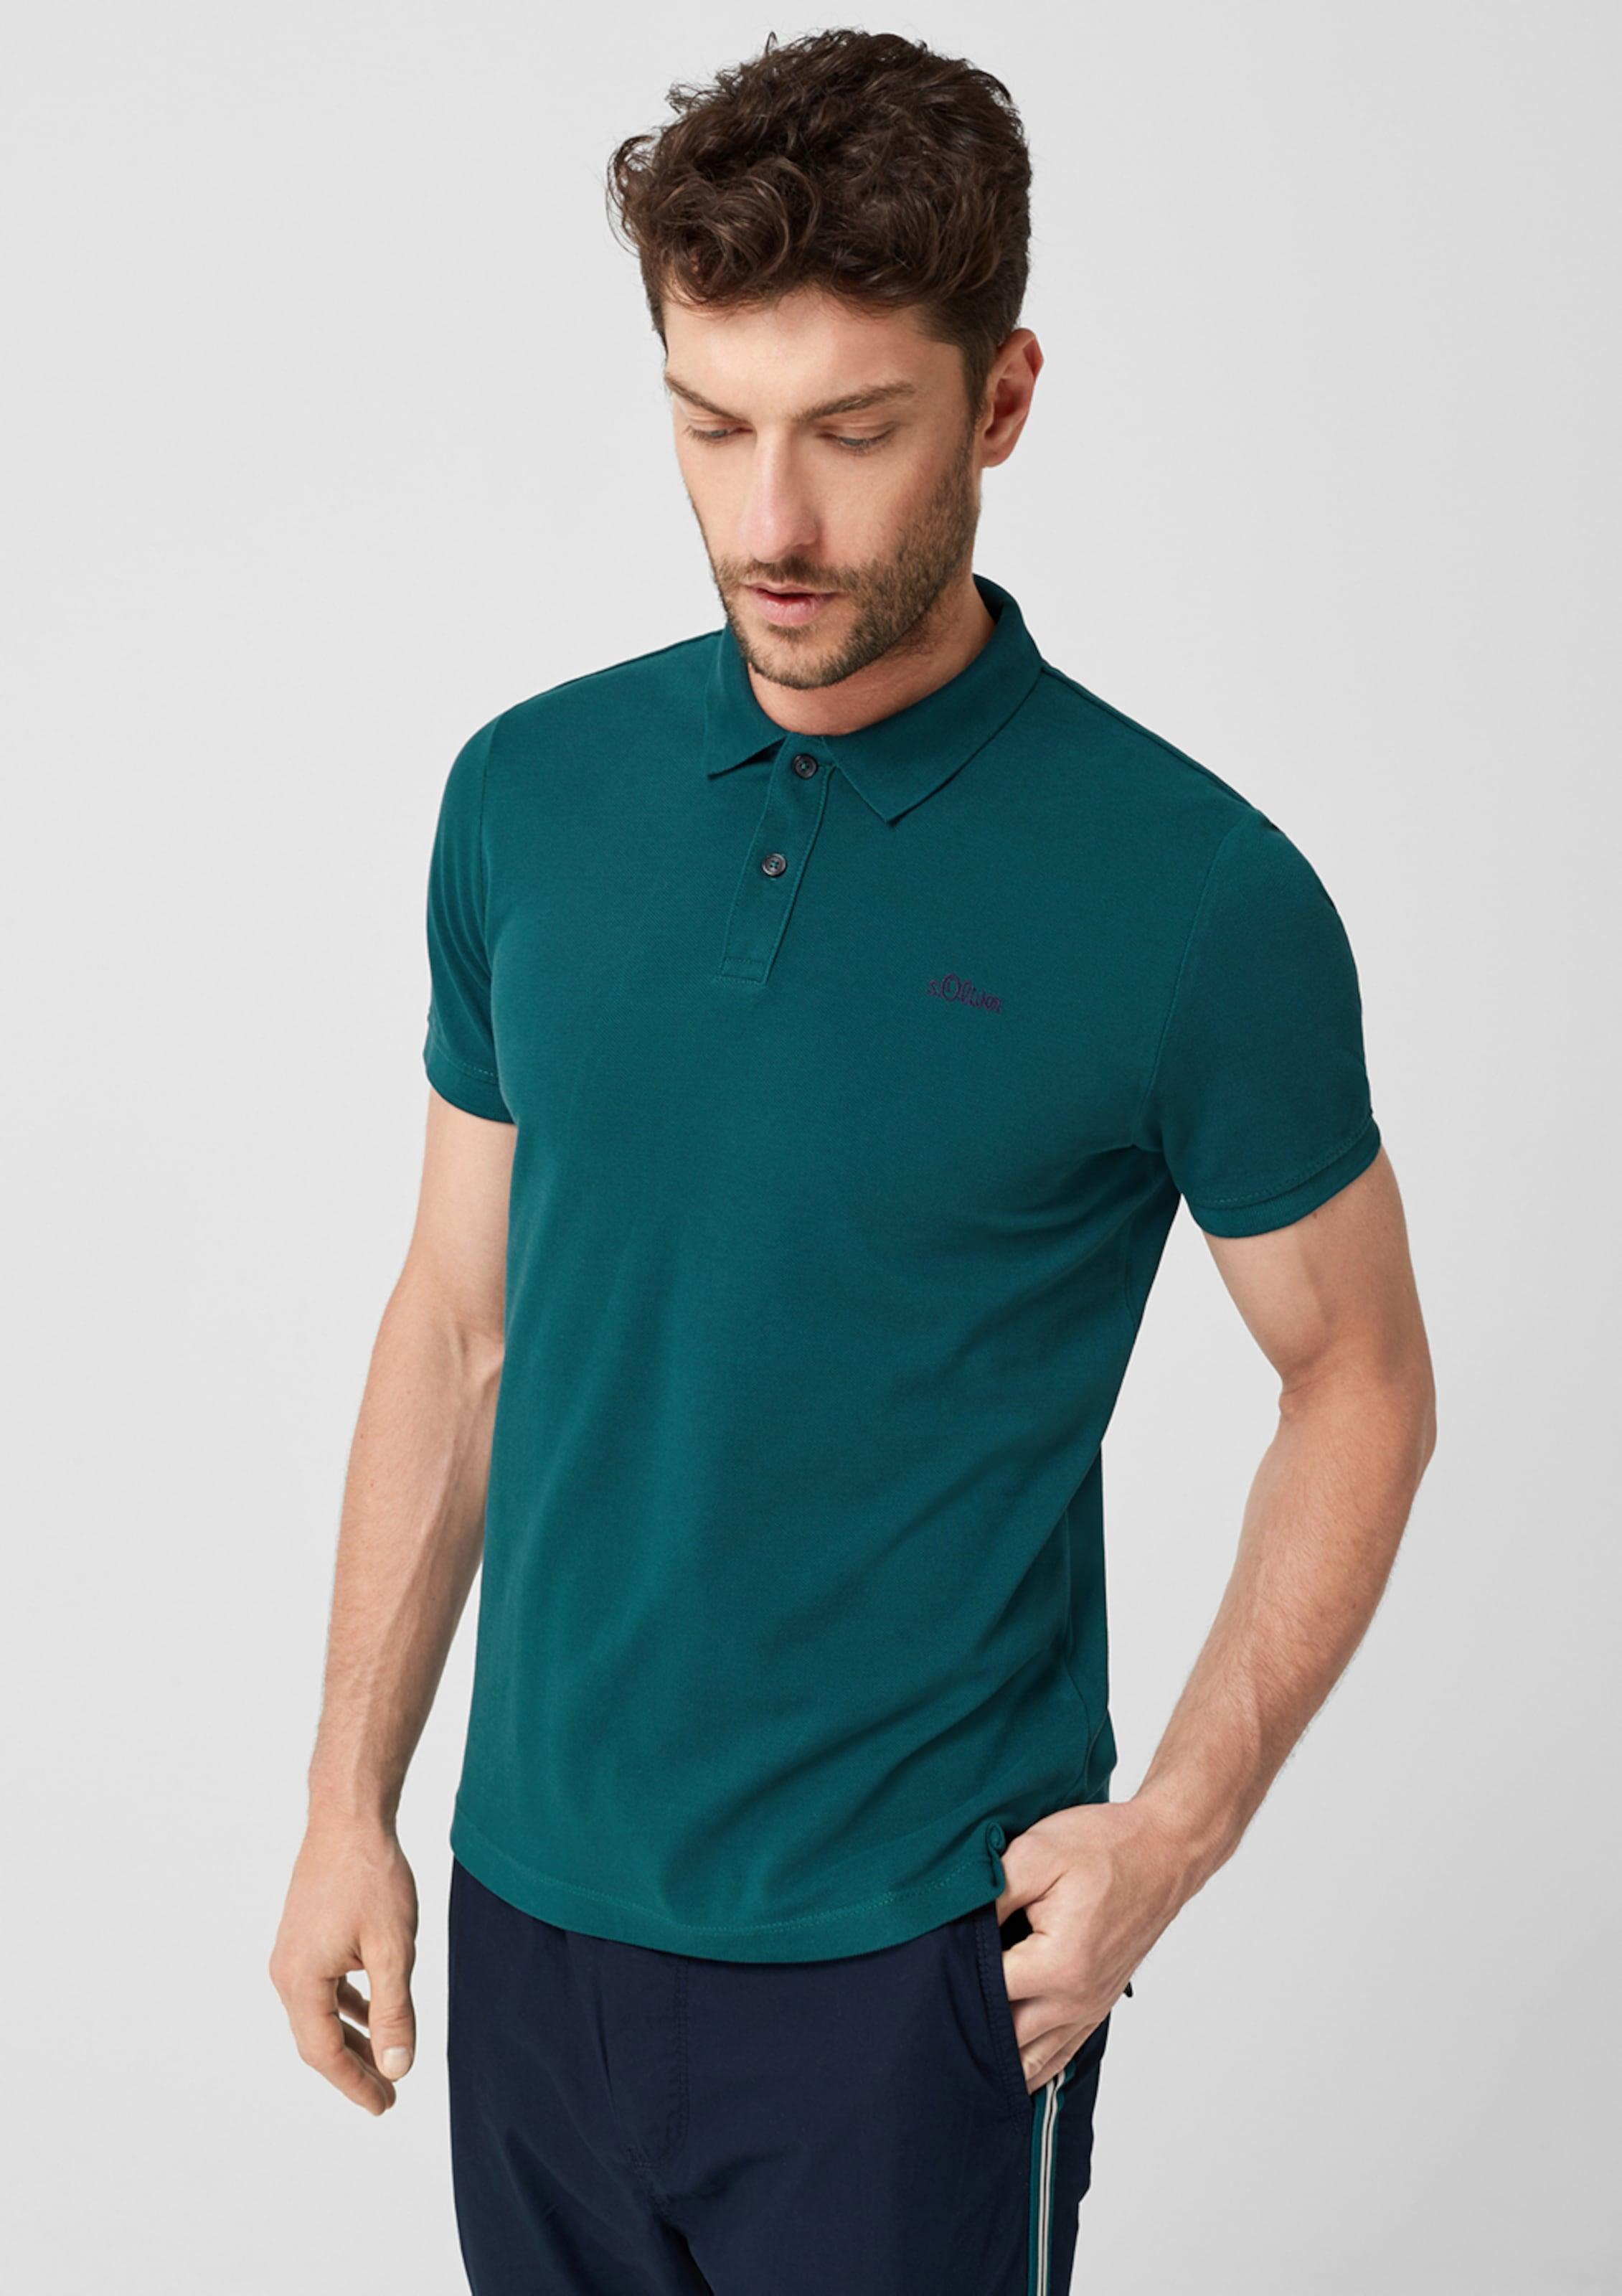 oliver Red S Label Pastellblau Poloshirt In wmNnO80v